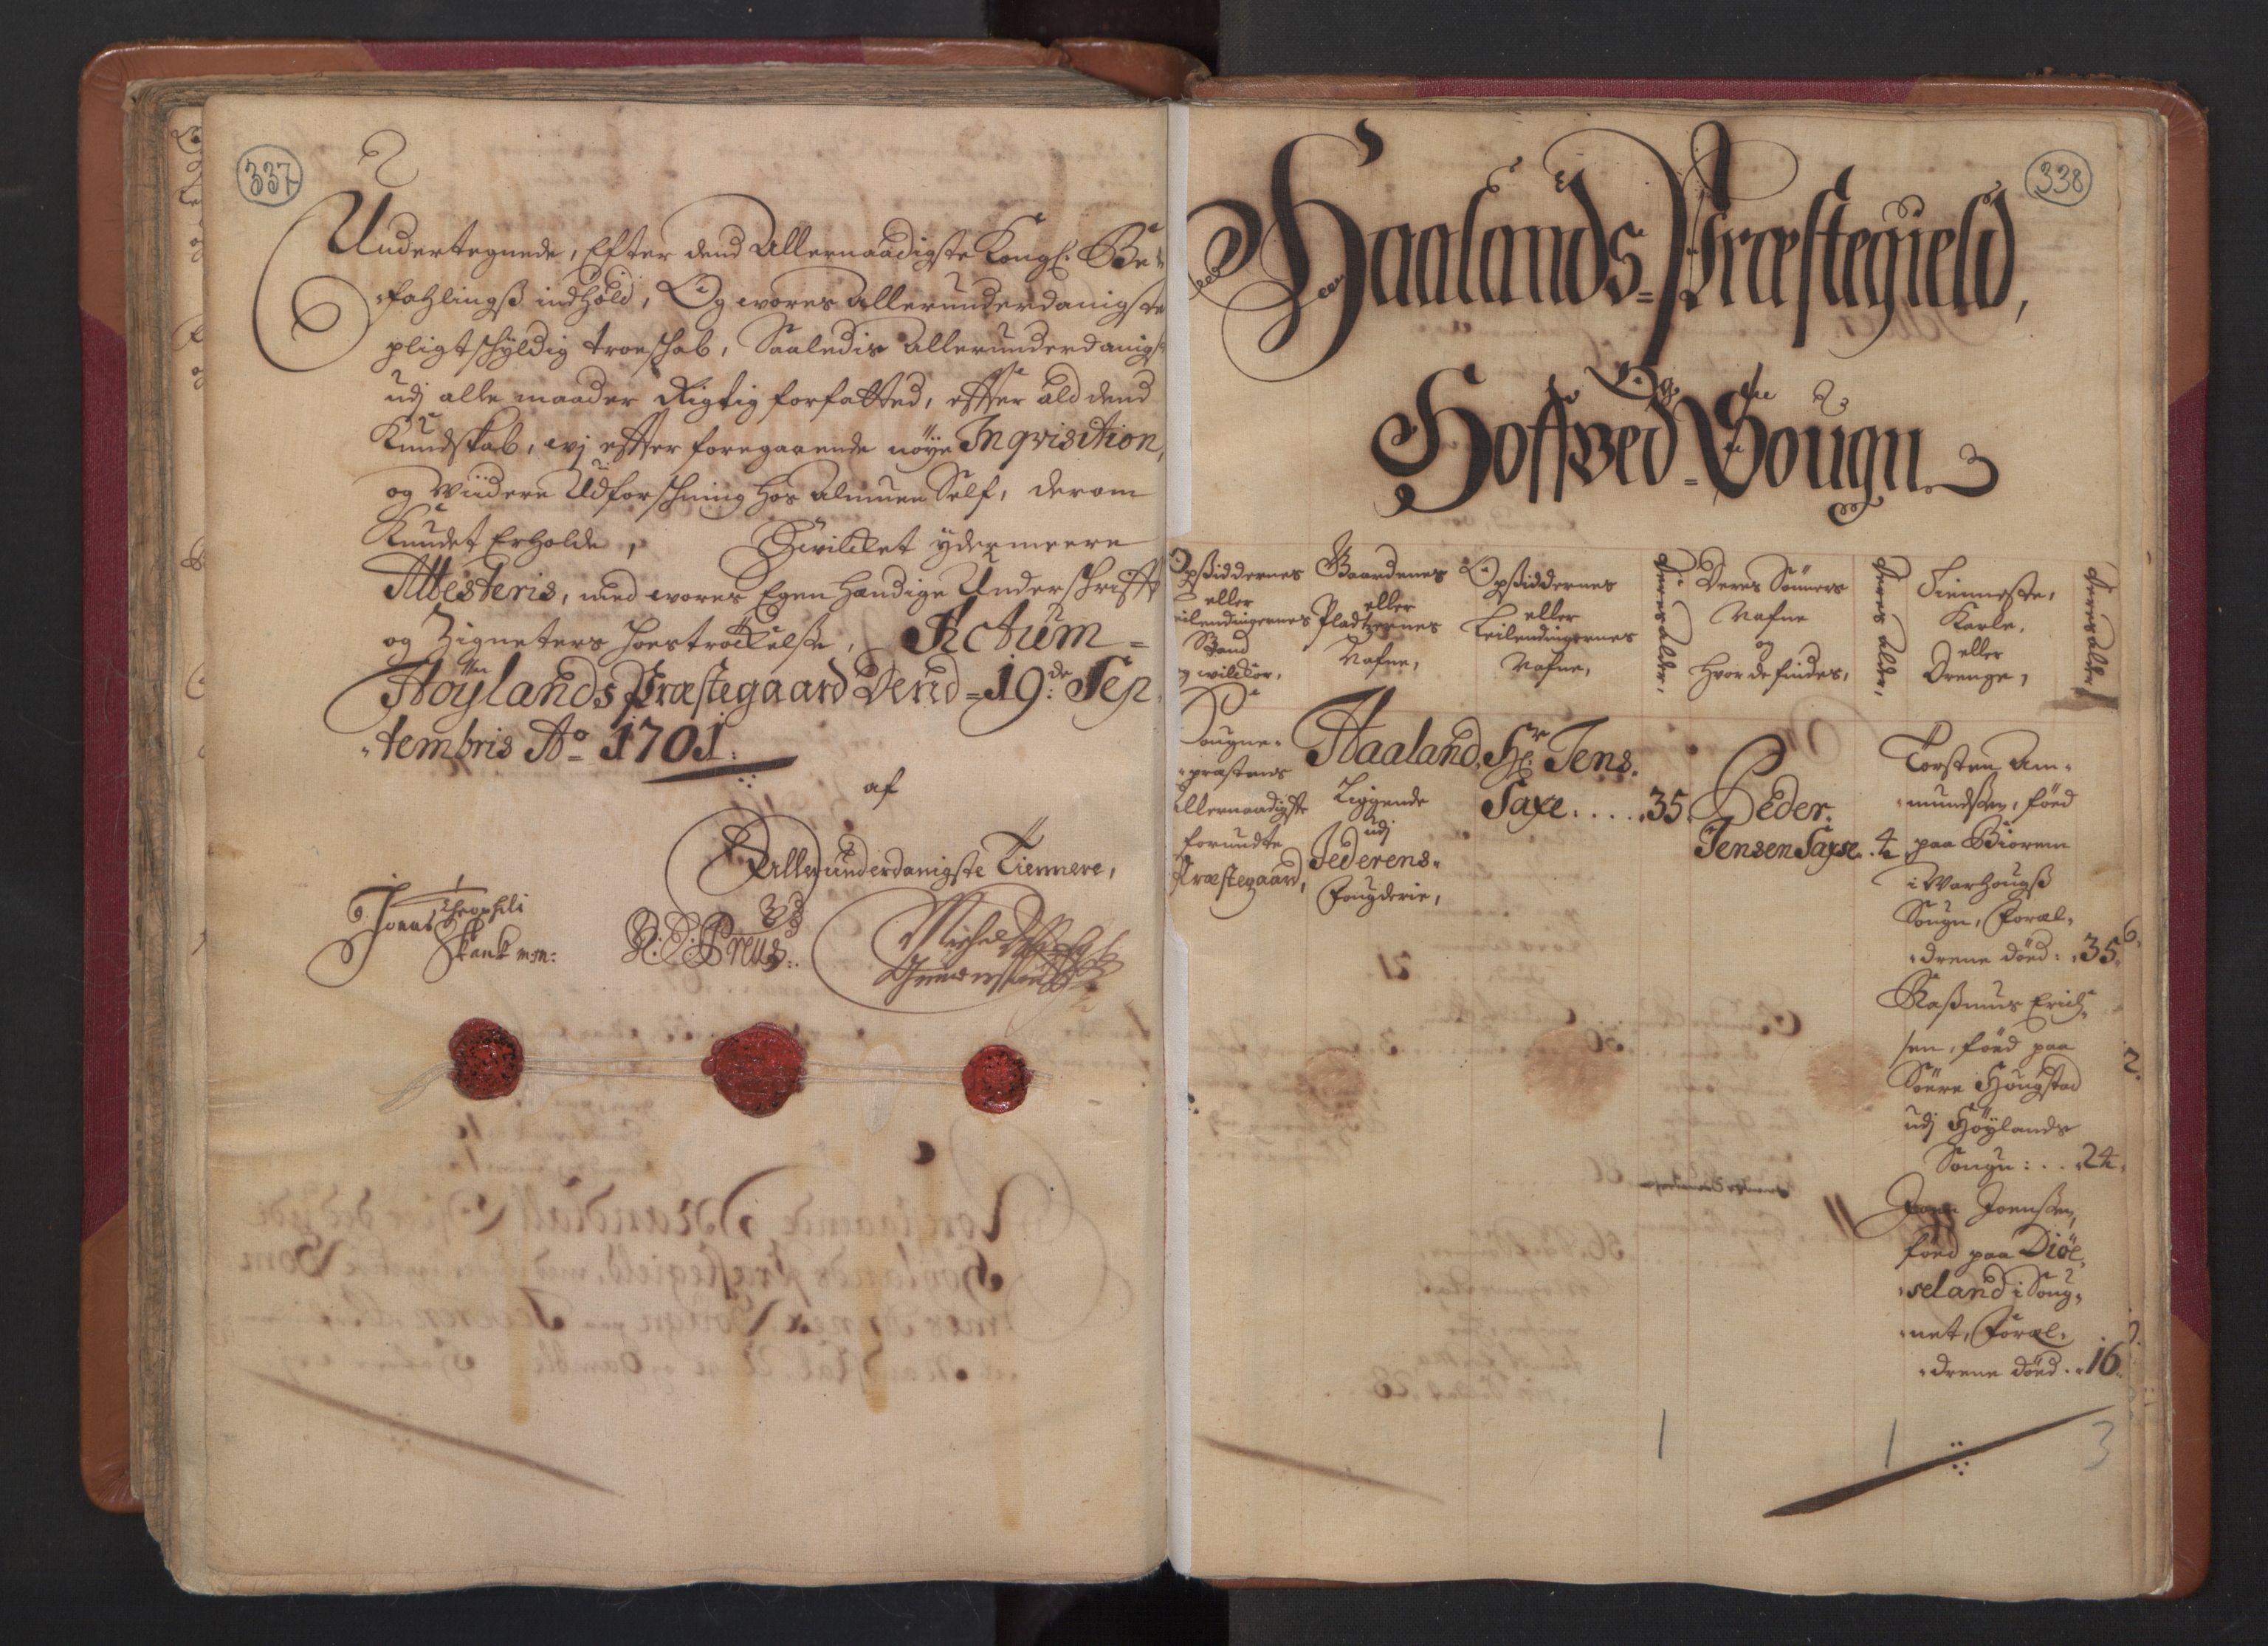 RA, Manntallet 1701, nr. 4: Jæren og Dalane fogderi, 1701, s. 337-338